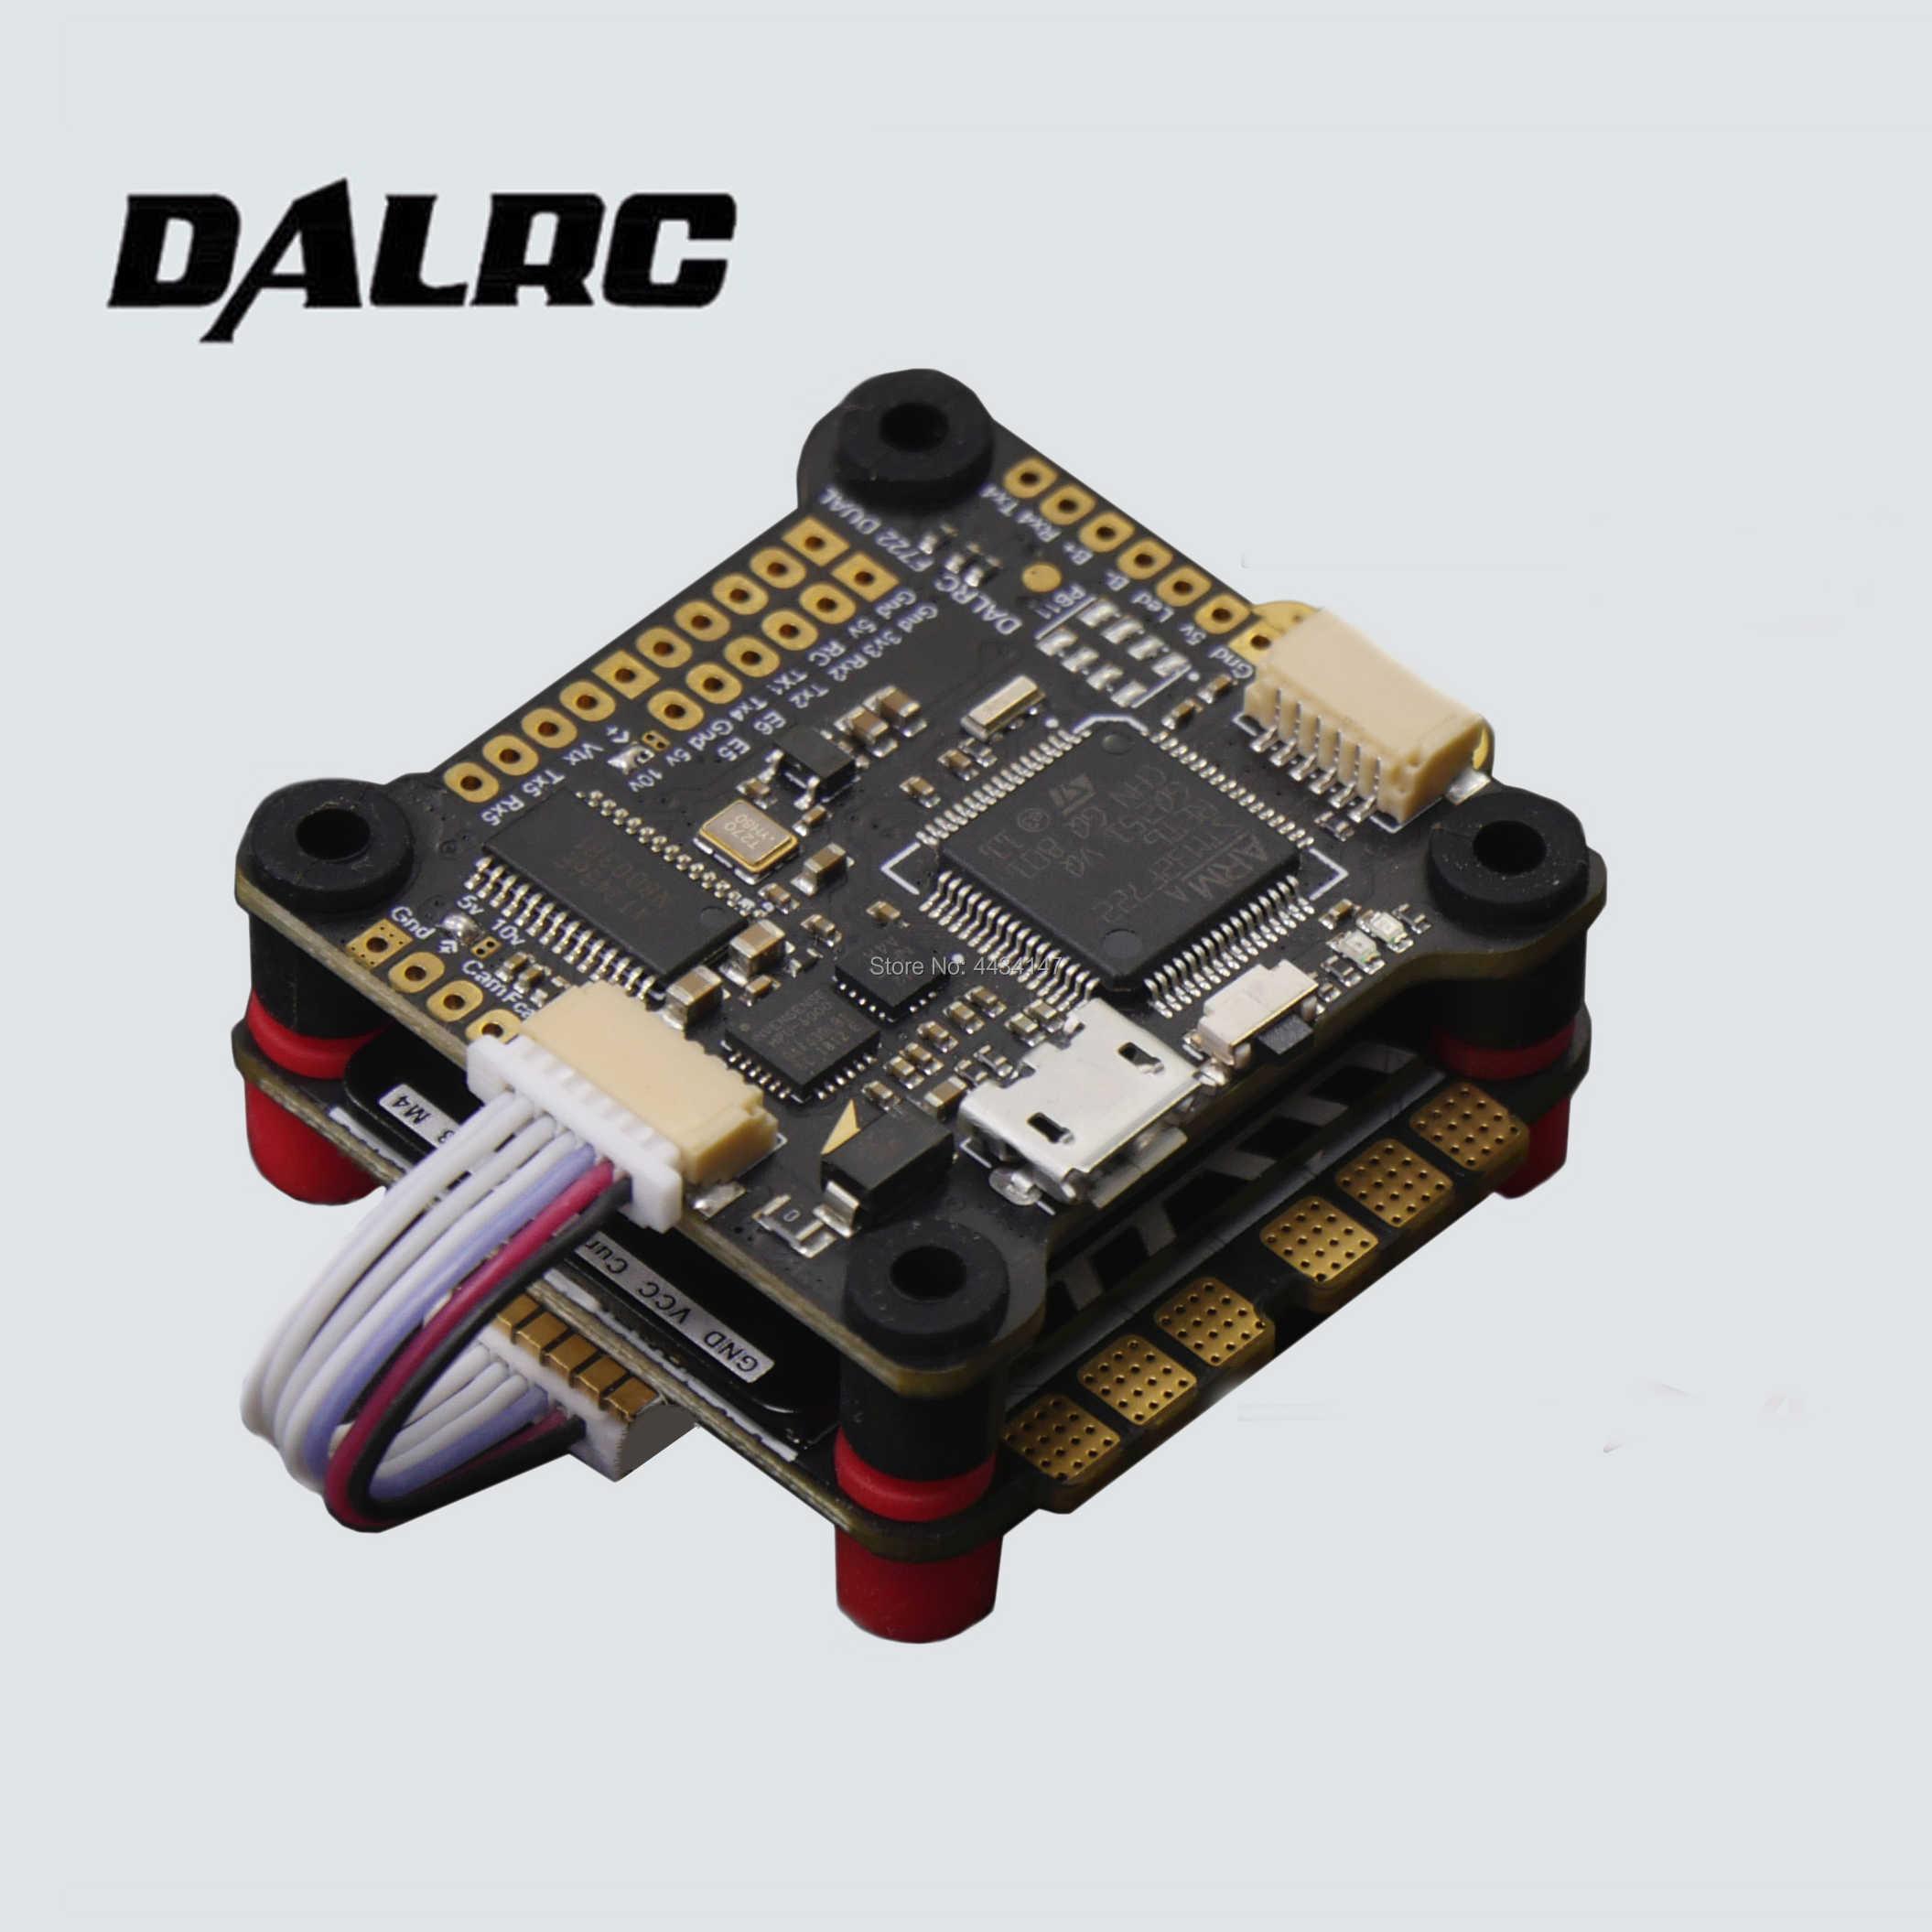 DALRC F722 DUAL STM32F722RGT6 Flight Controller Built-in OSD BEC 5V on